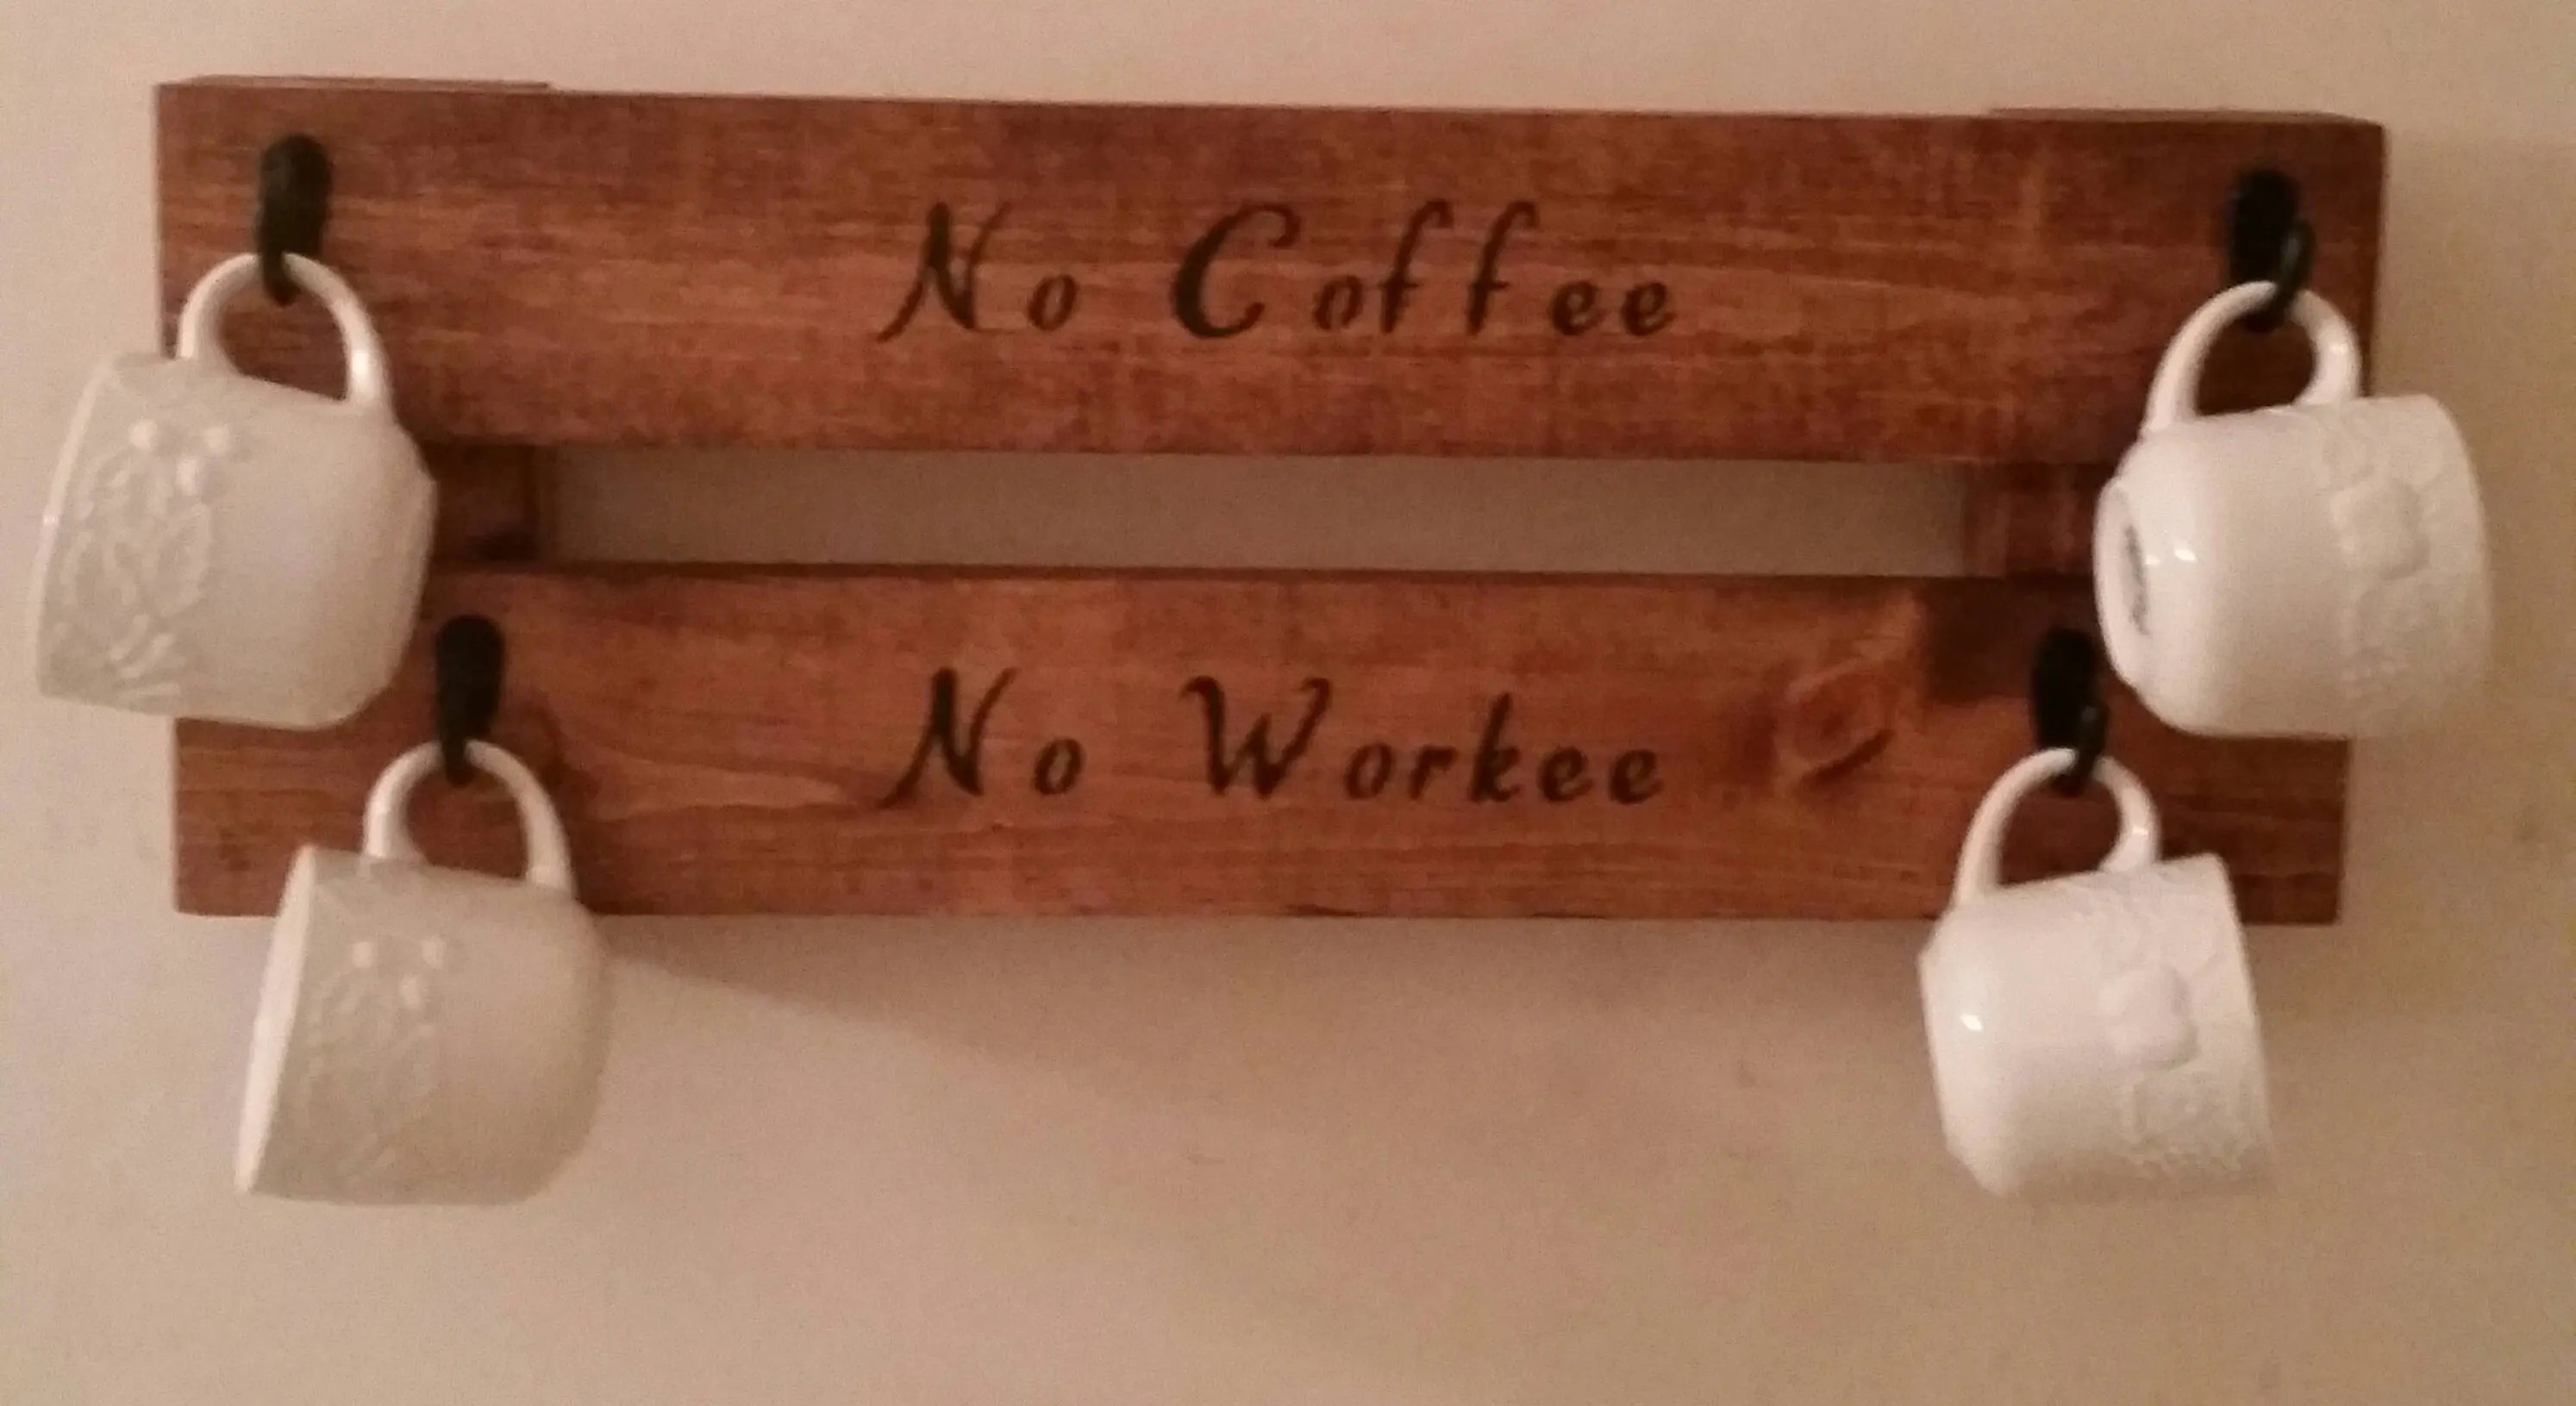 Fullsize Of Coffee Mug Rack